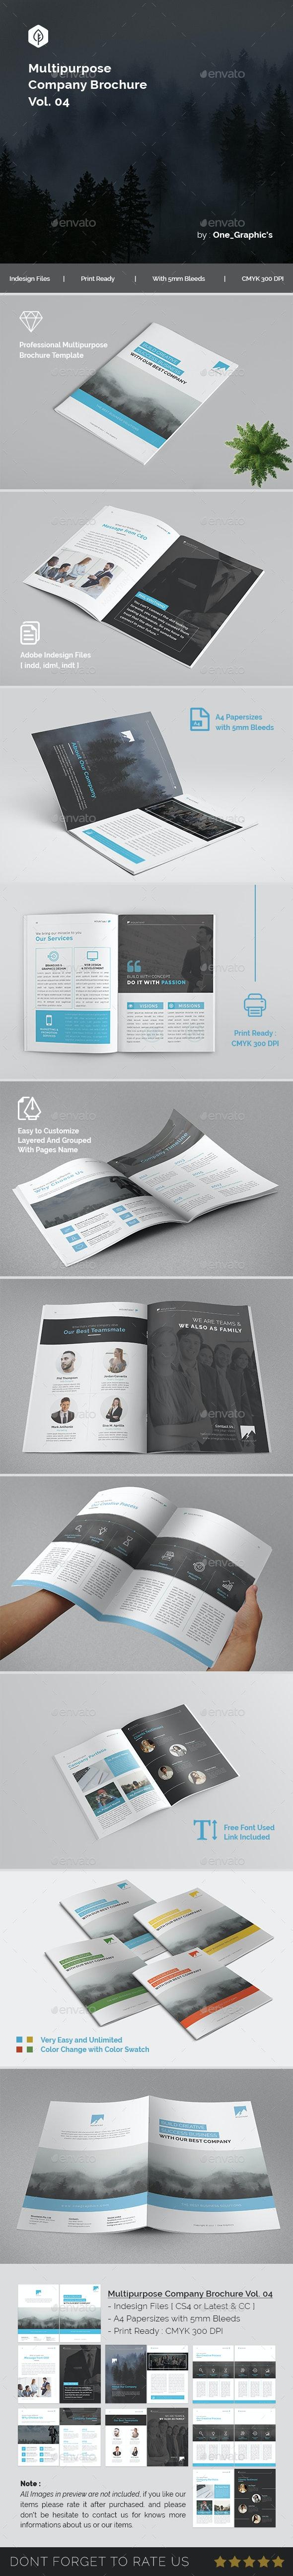 Multipurpose Corporate Brochure Template Vol. 04 - Brochures Print Templates